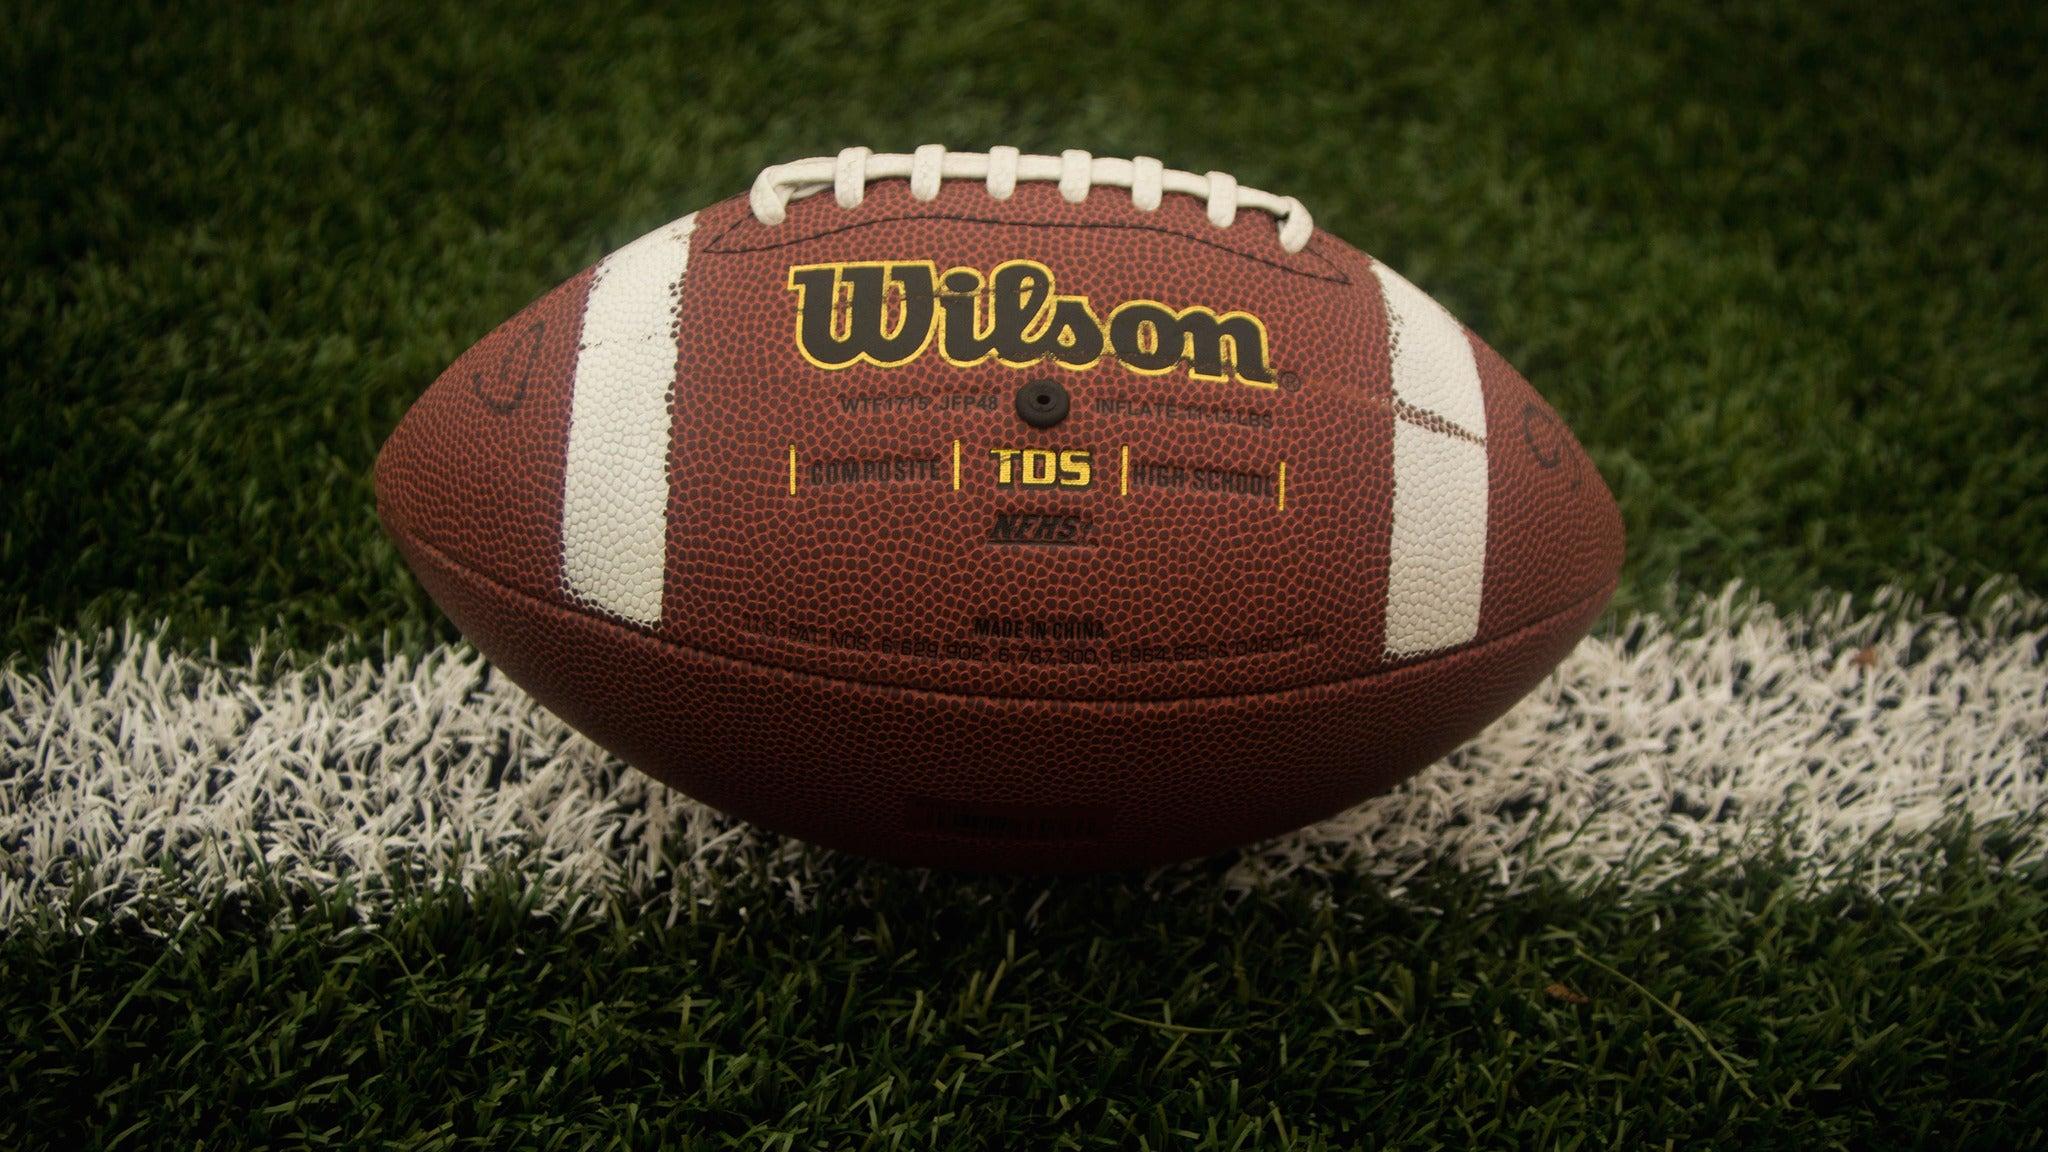 Michigan Wolverines Football vs. Rutgers Scarlet Knights Football